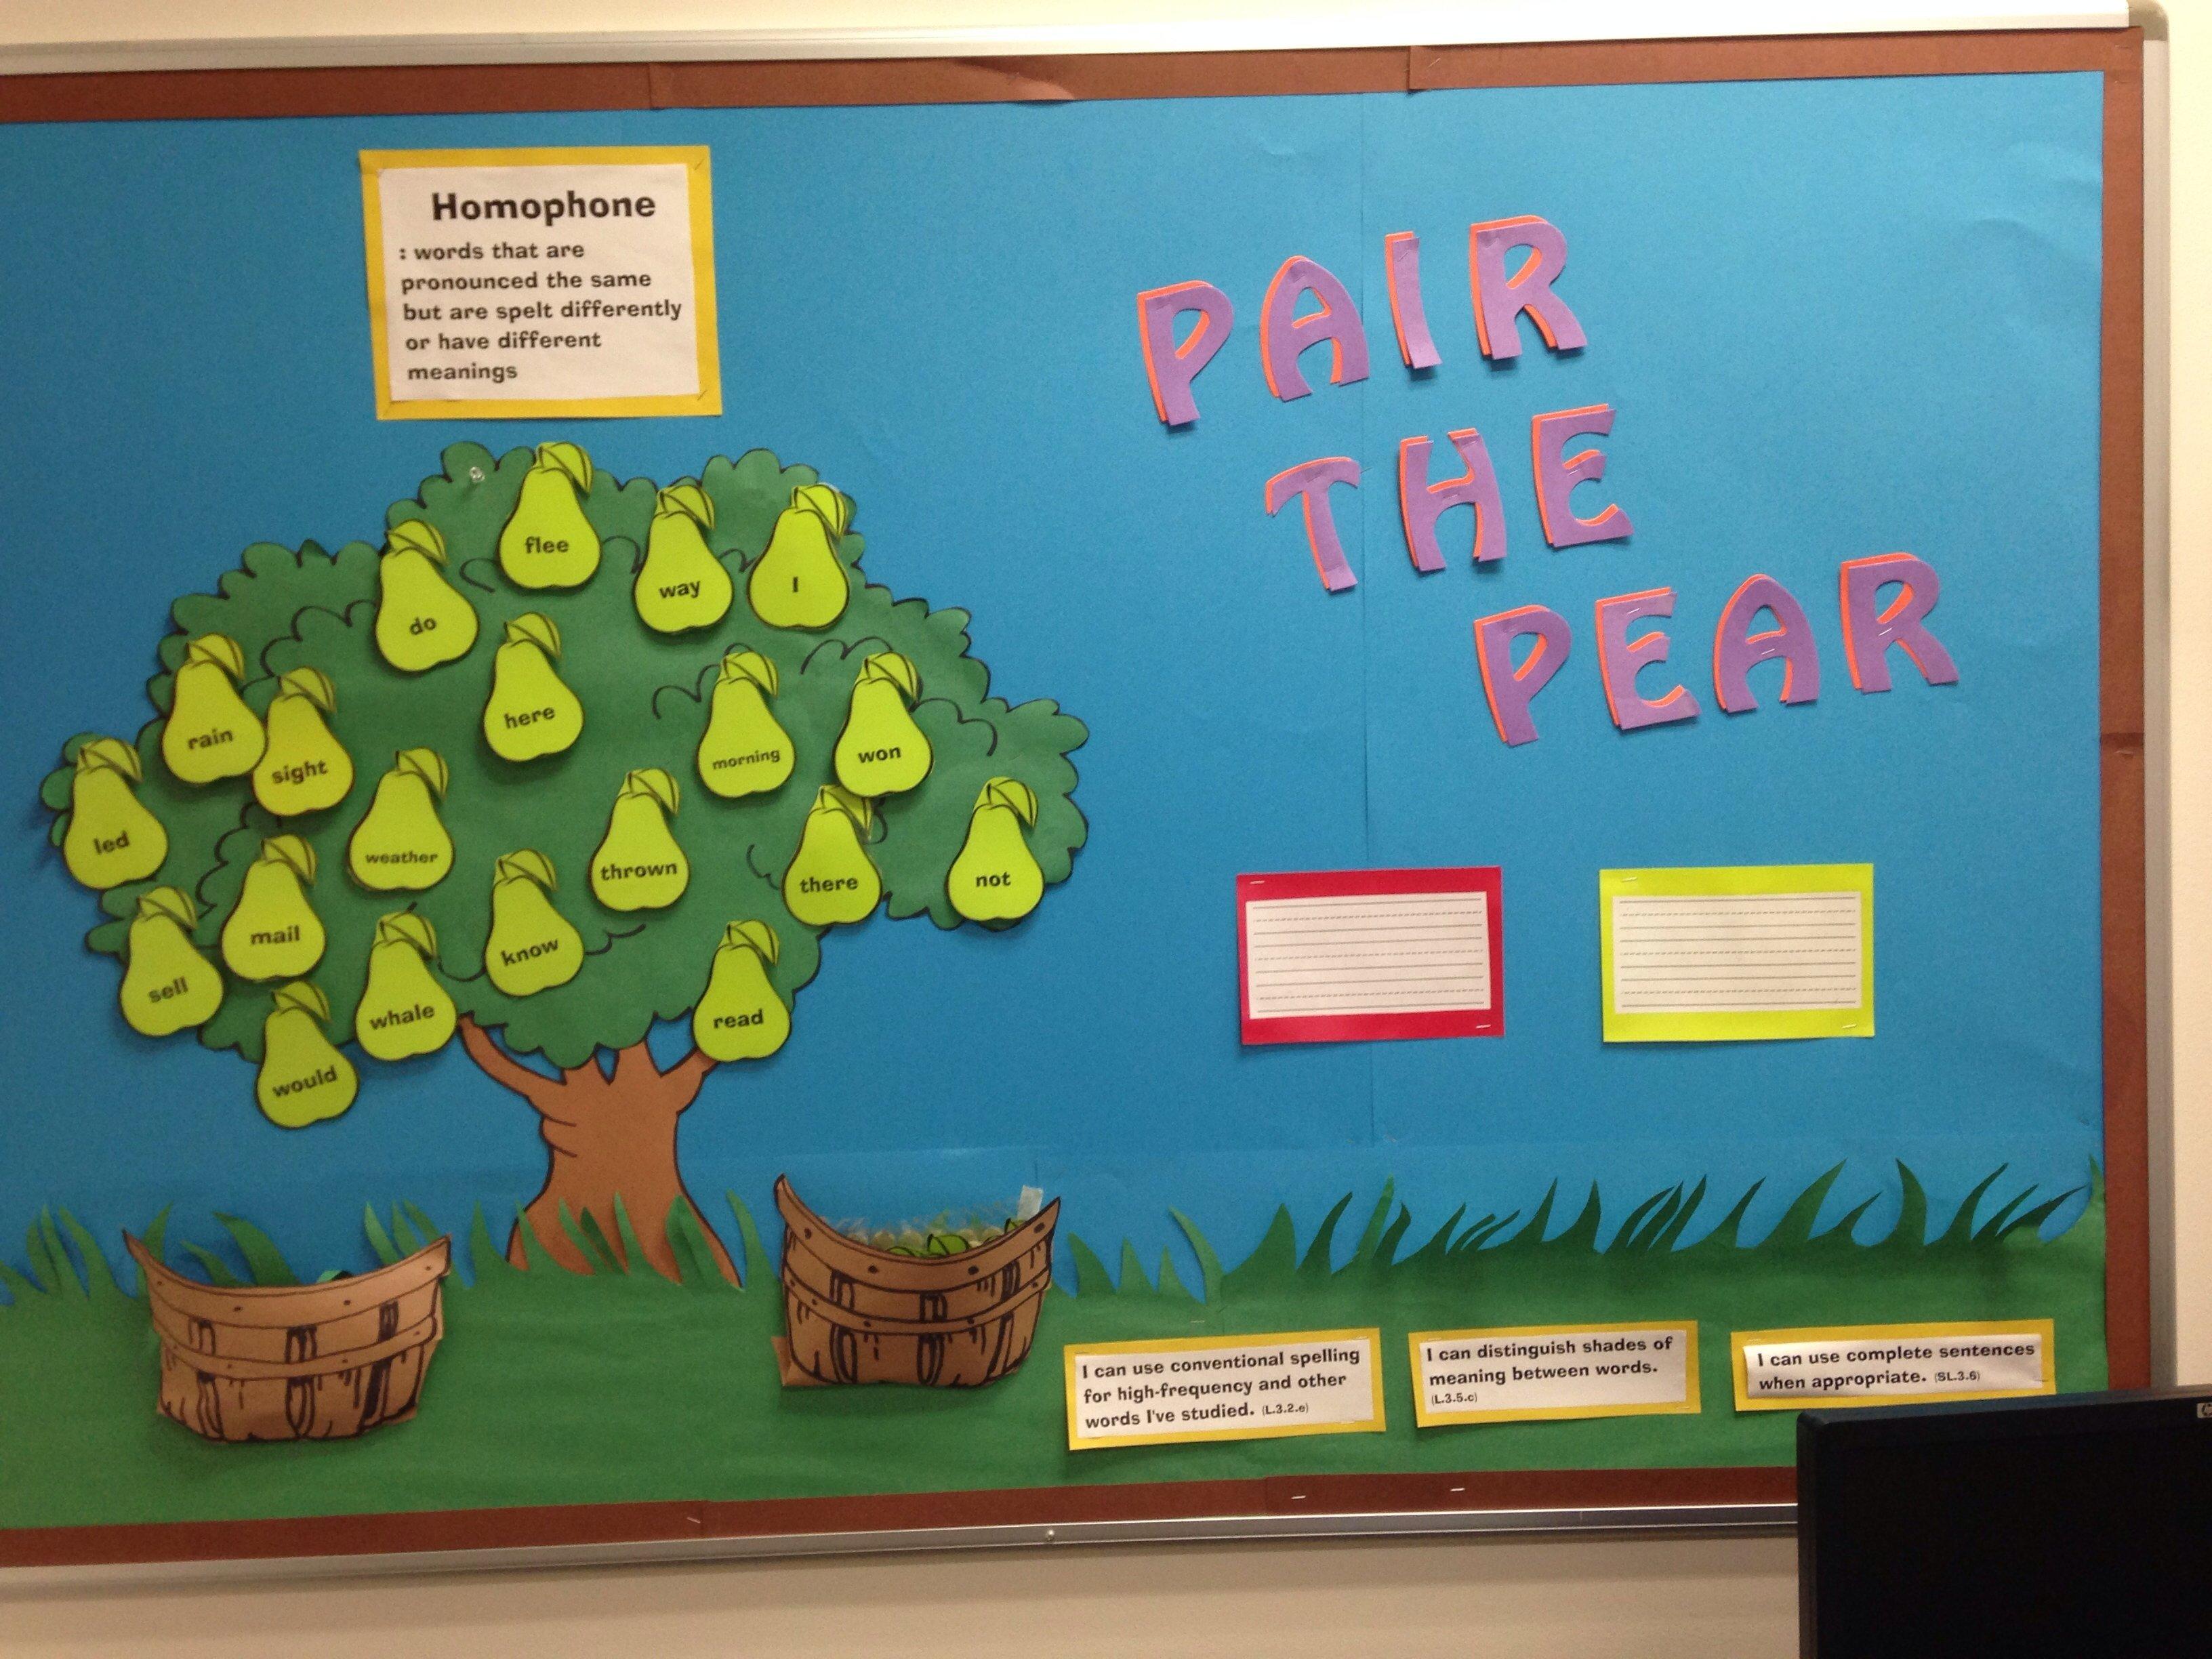 10 Fabulous Elementary School Bulletin Board Ideas pair the pear interactive bulletin board about homophones teacher 2020